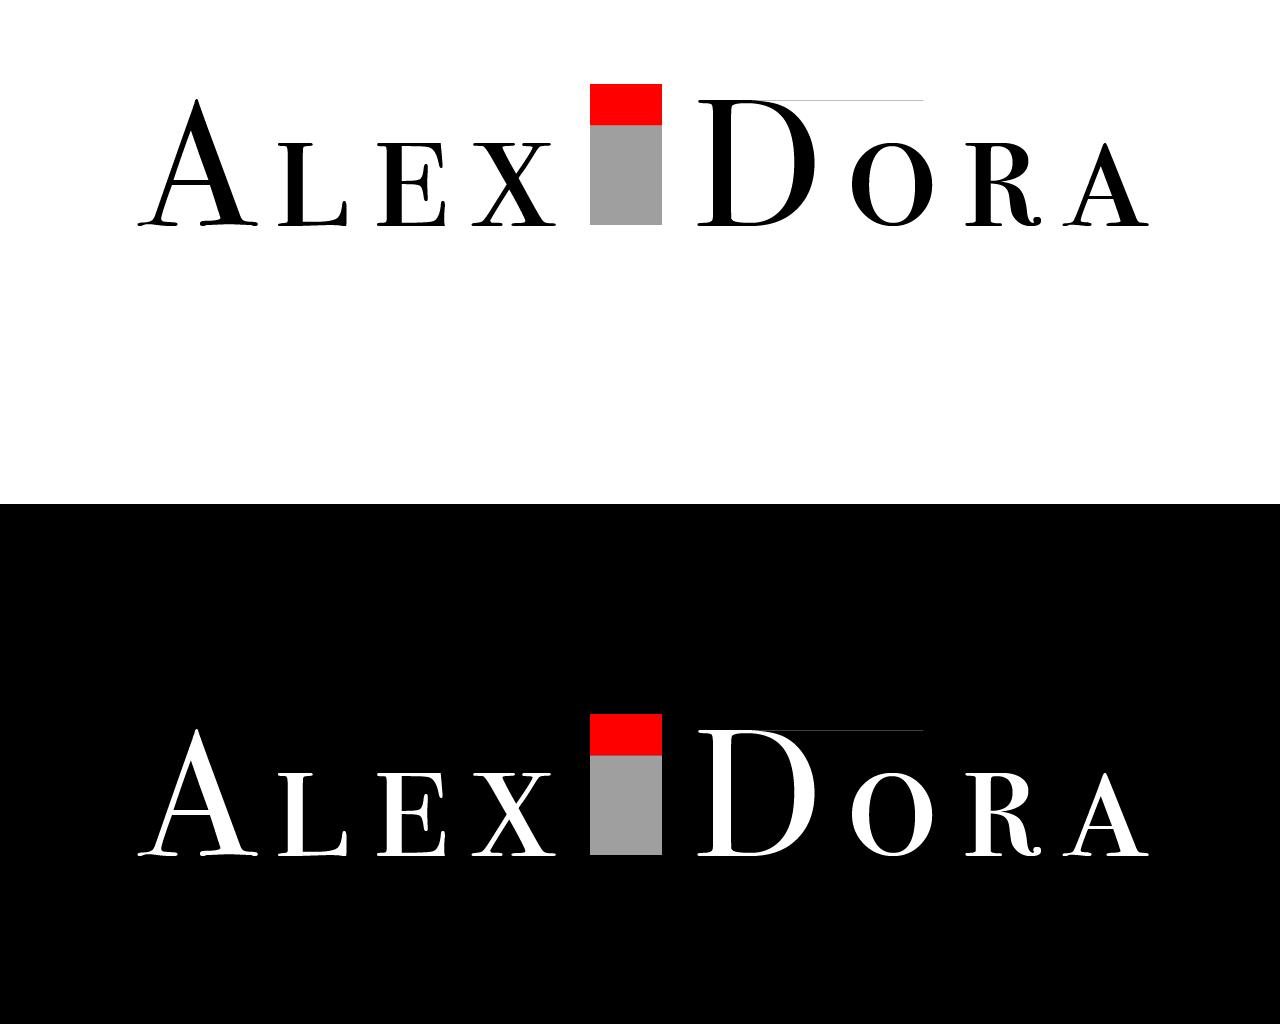 Необходим дизайнер для доработки логотипа бренда одежды фото f_1085b38fa49cb6e9.png